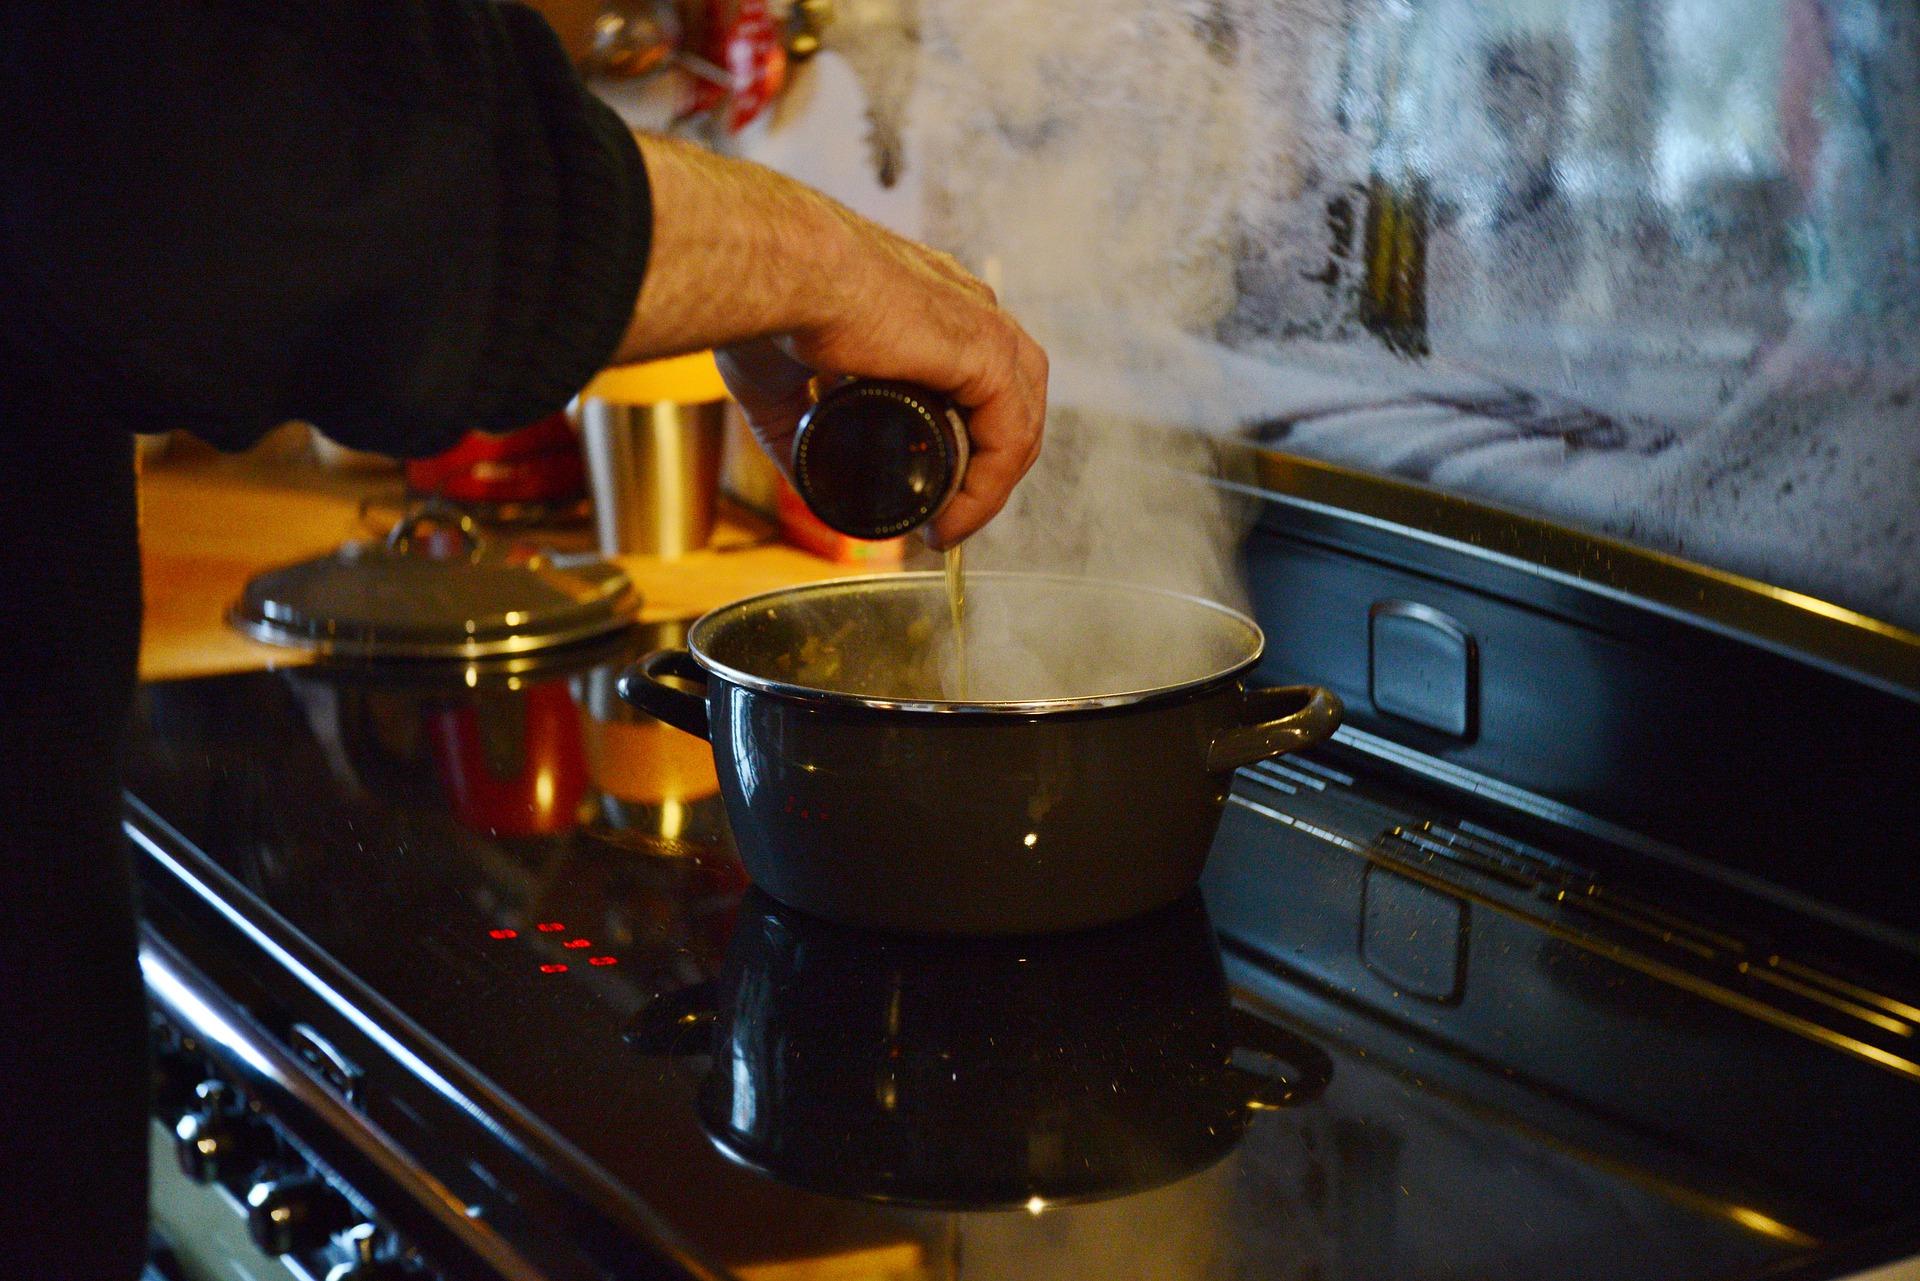 Una persona cuinant | Pixabay